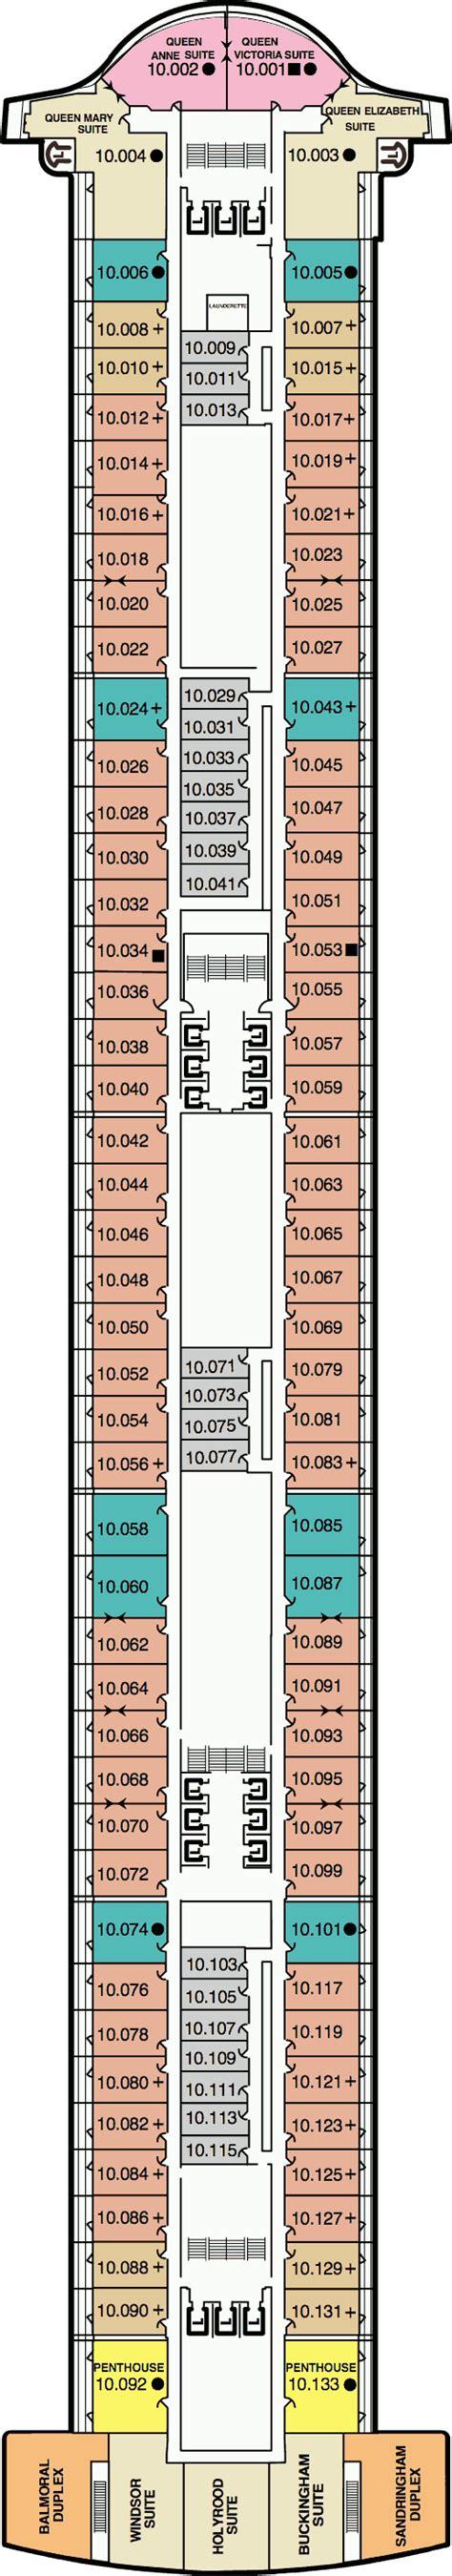 cunard cabin layout 2 deck plans